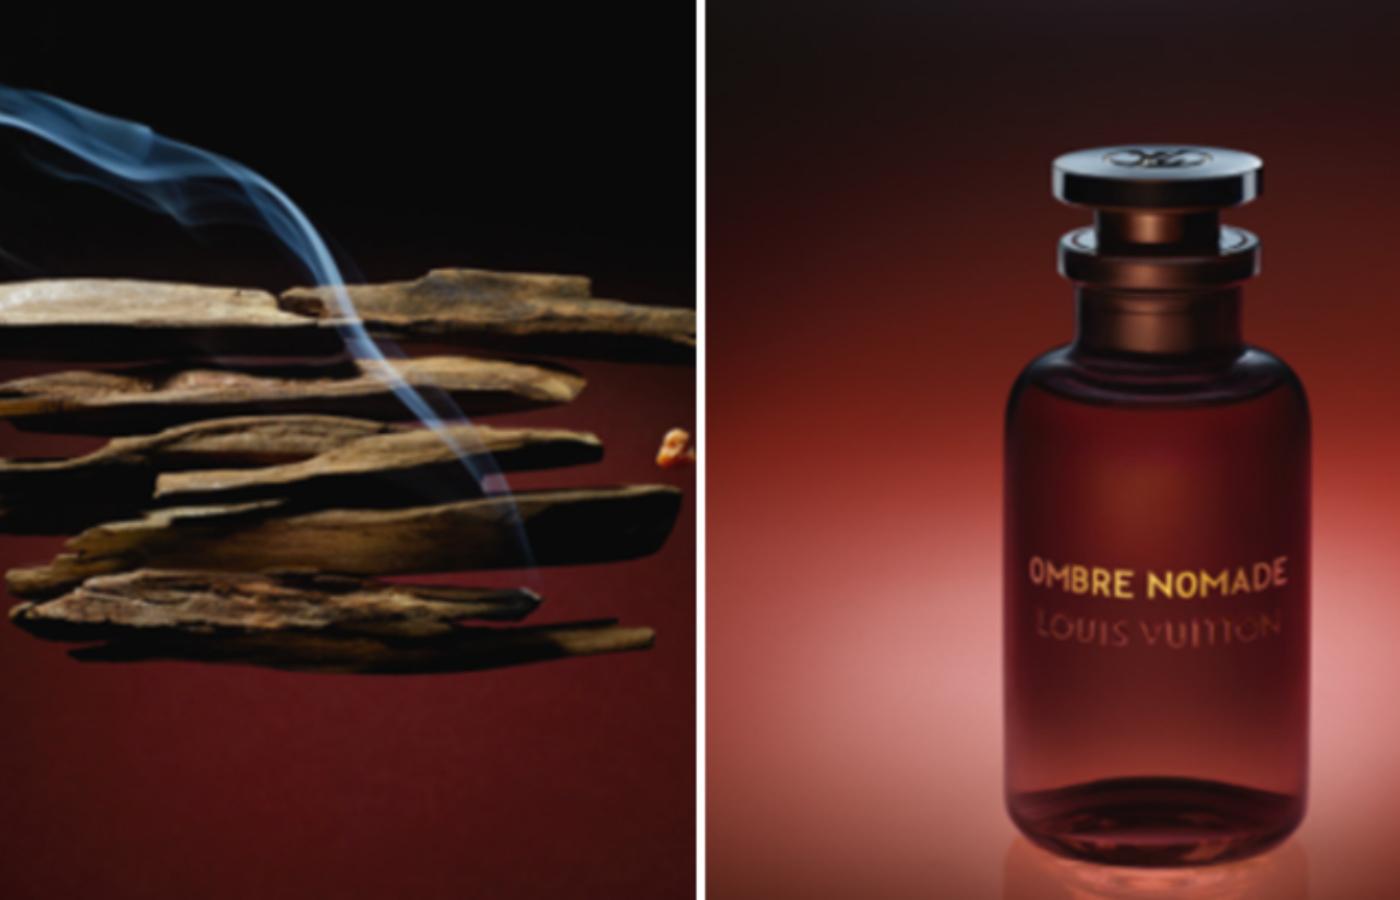 Louis Vuitton Launches Les Parfums Ombre Nomade The Glass Magazine